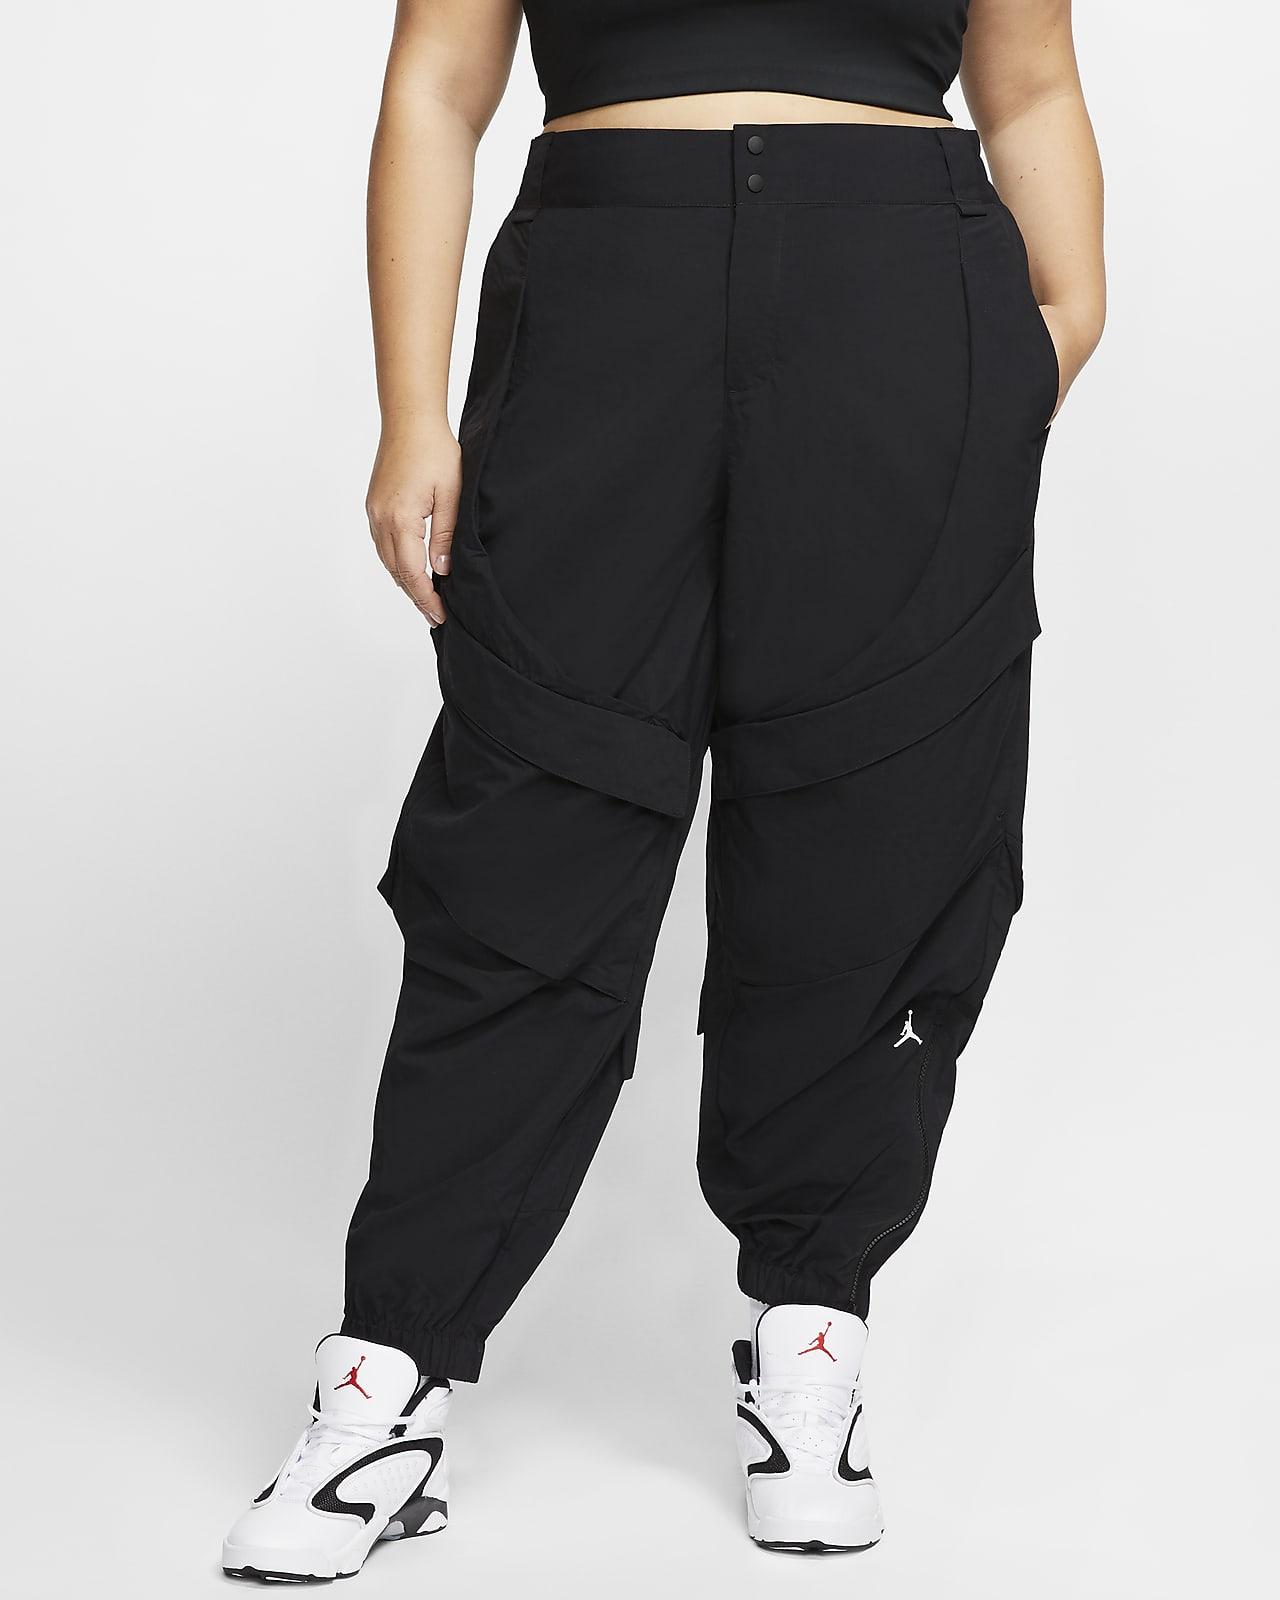 Jordan Women's Utility Trousers. Nike CZ